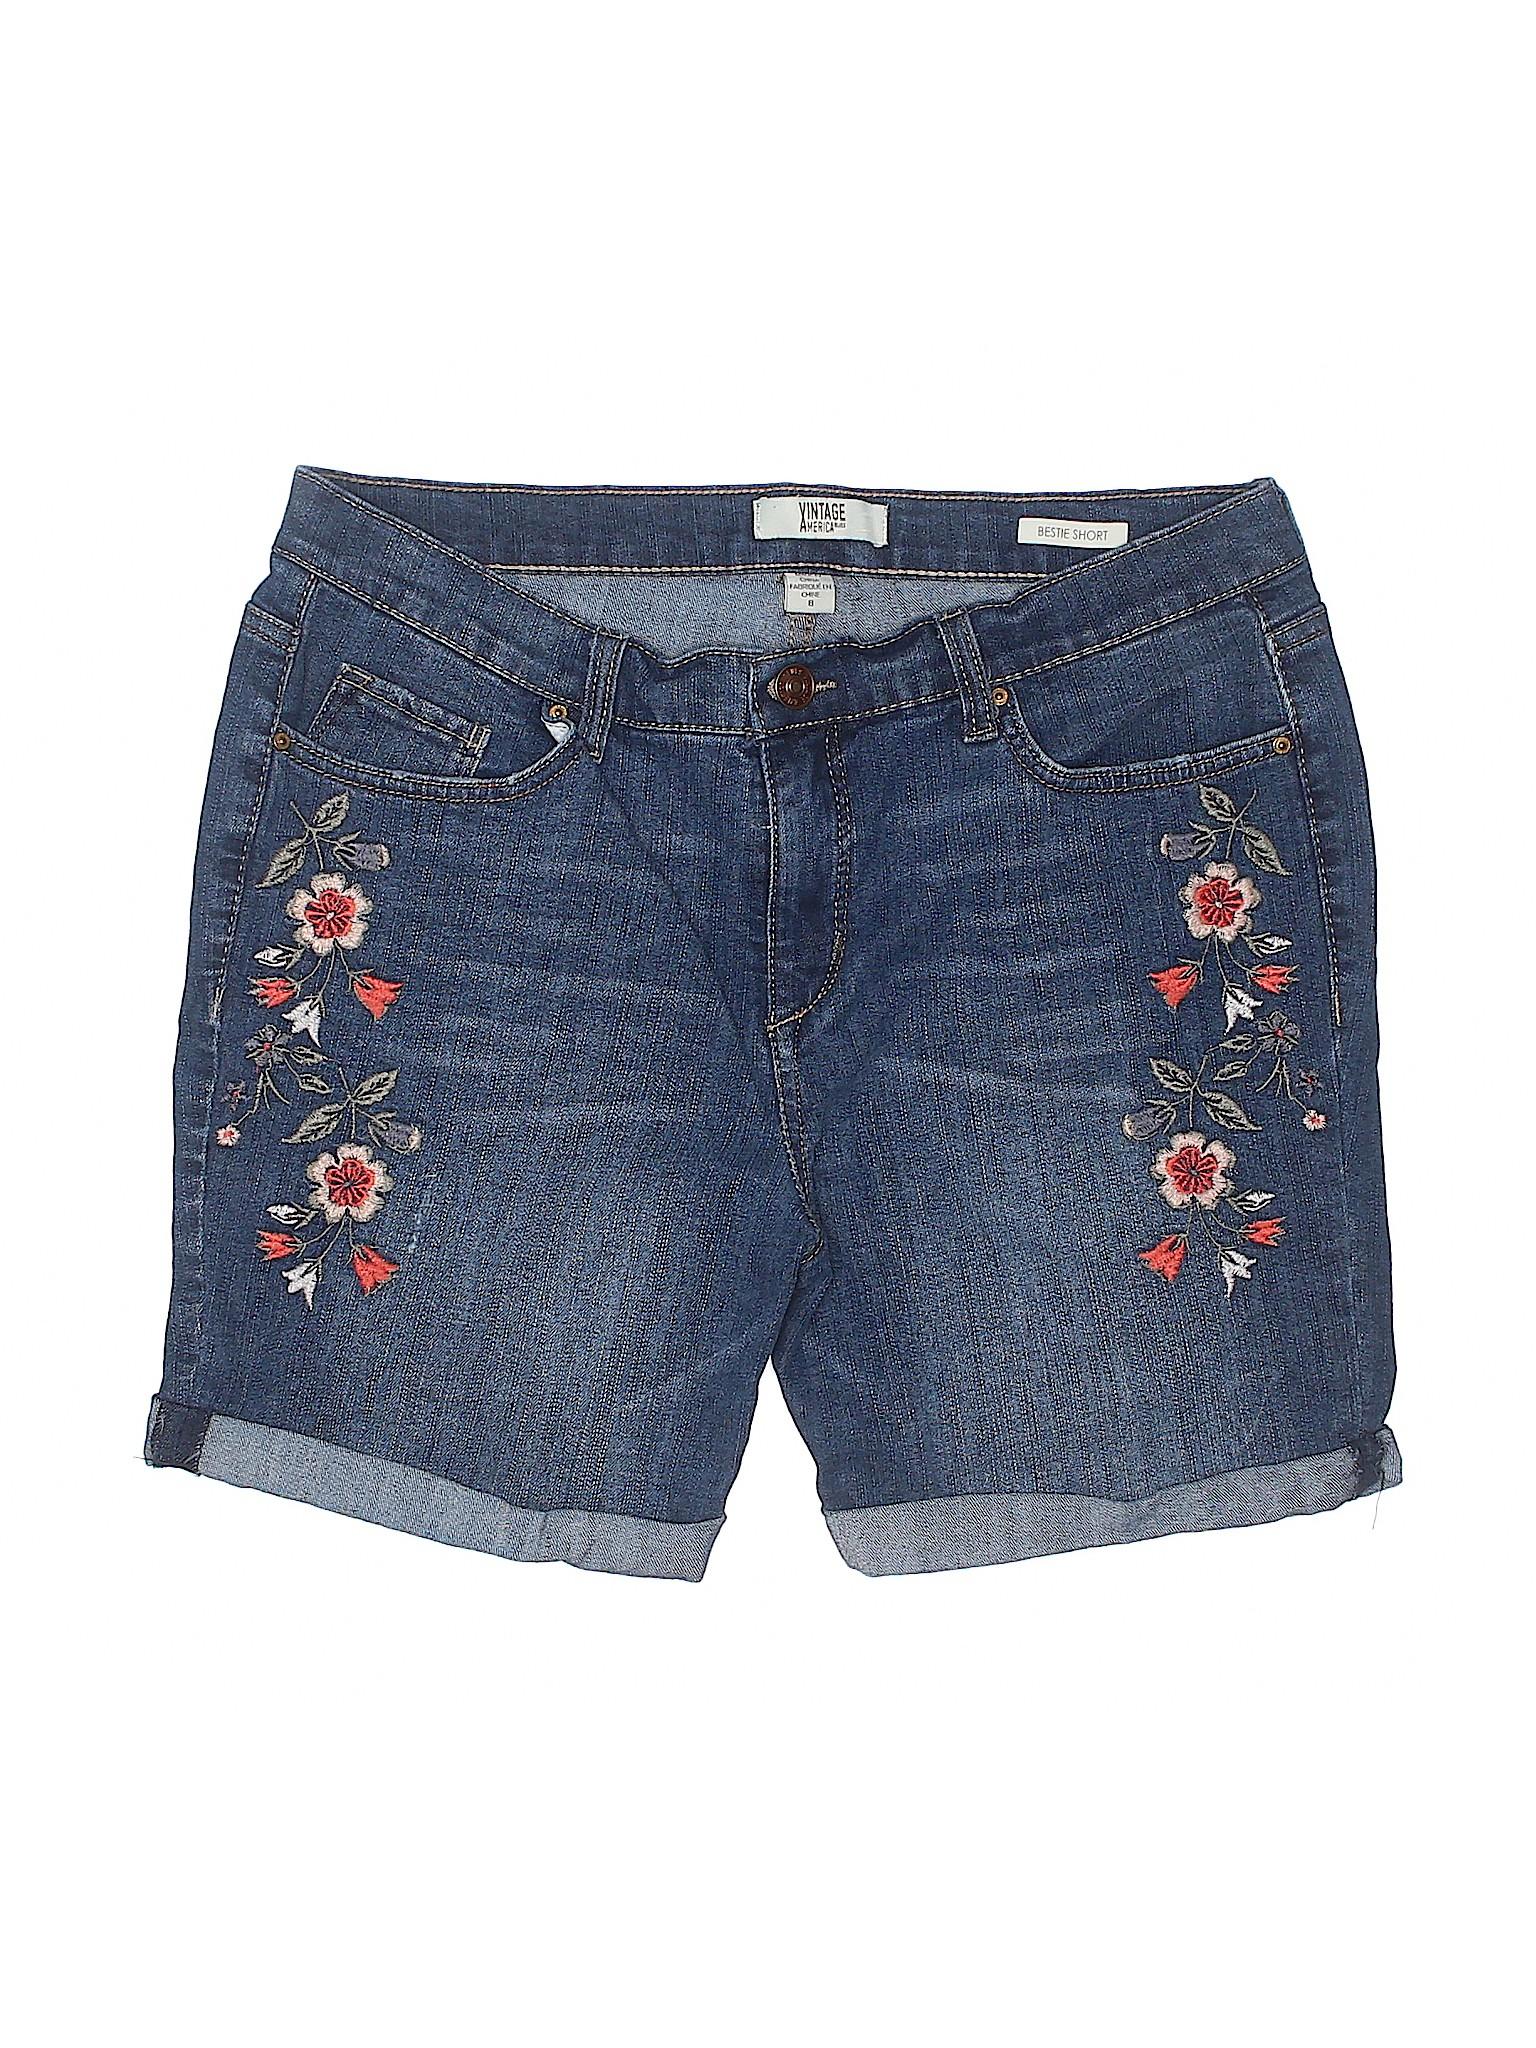 Shorts Vintage Denim Boutique Blues America qUOSvwOnIg